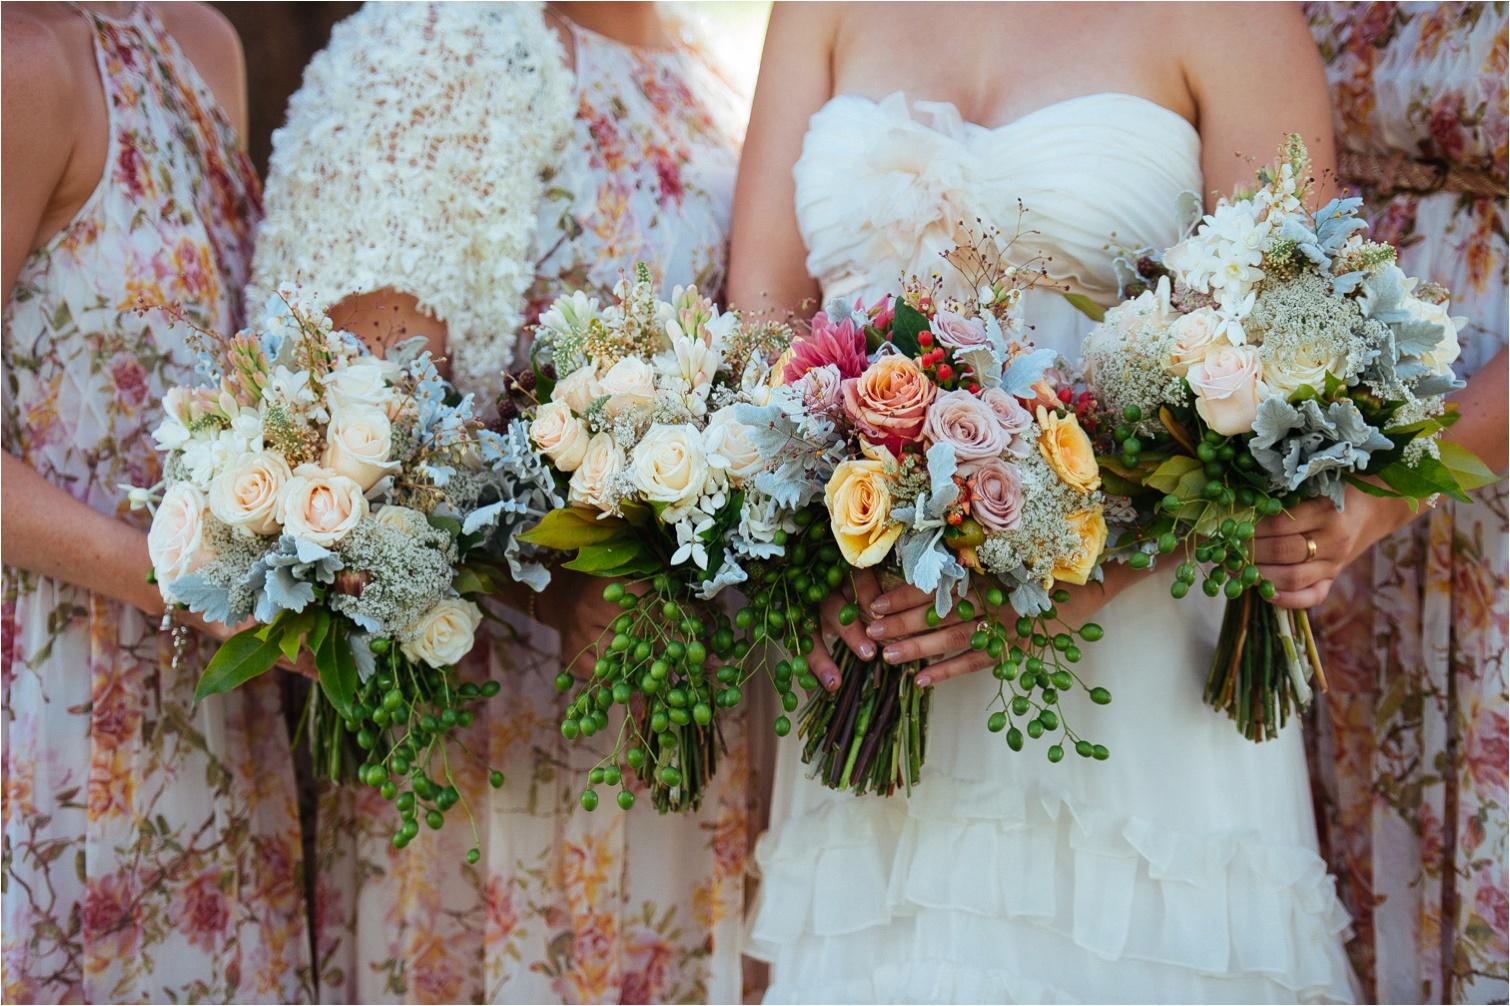 Jenny&Mitch_Sebel_Windsor_Sydney_Polo_Club_wedding-by_The_Follans_Gold_Coast_Wedding_Photographers_0034.jpg